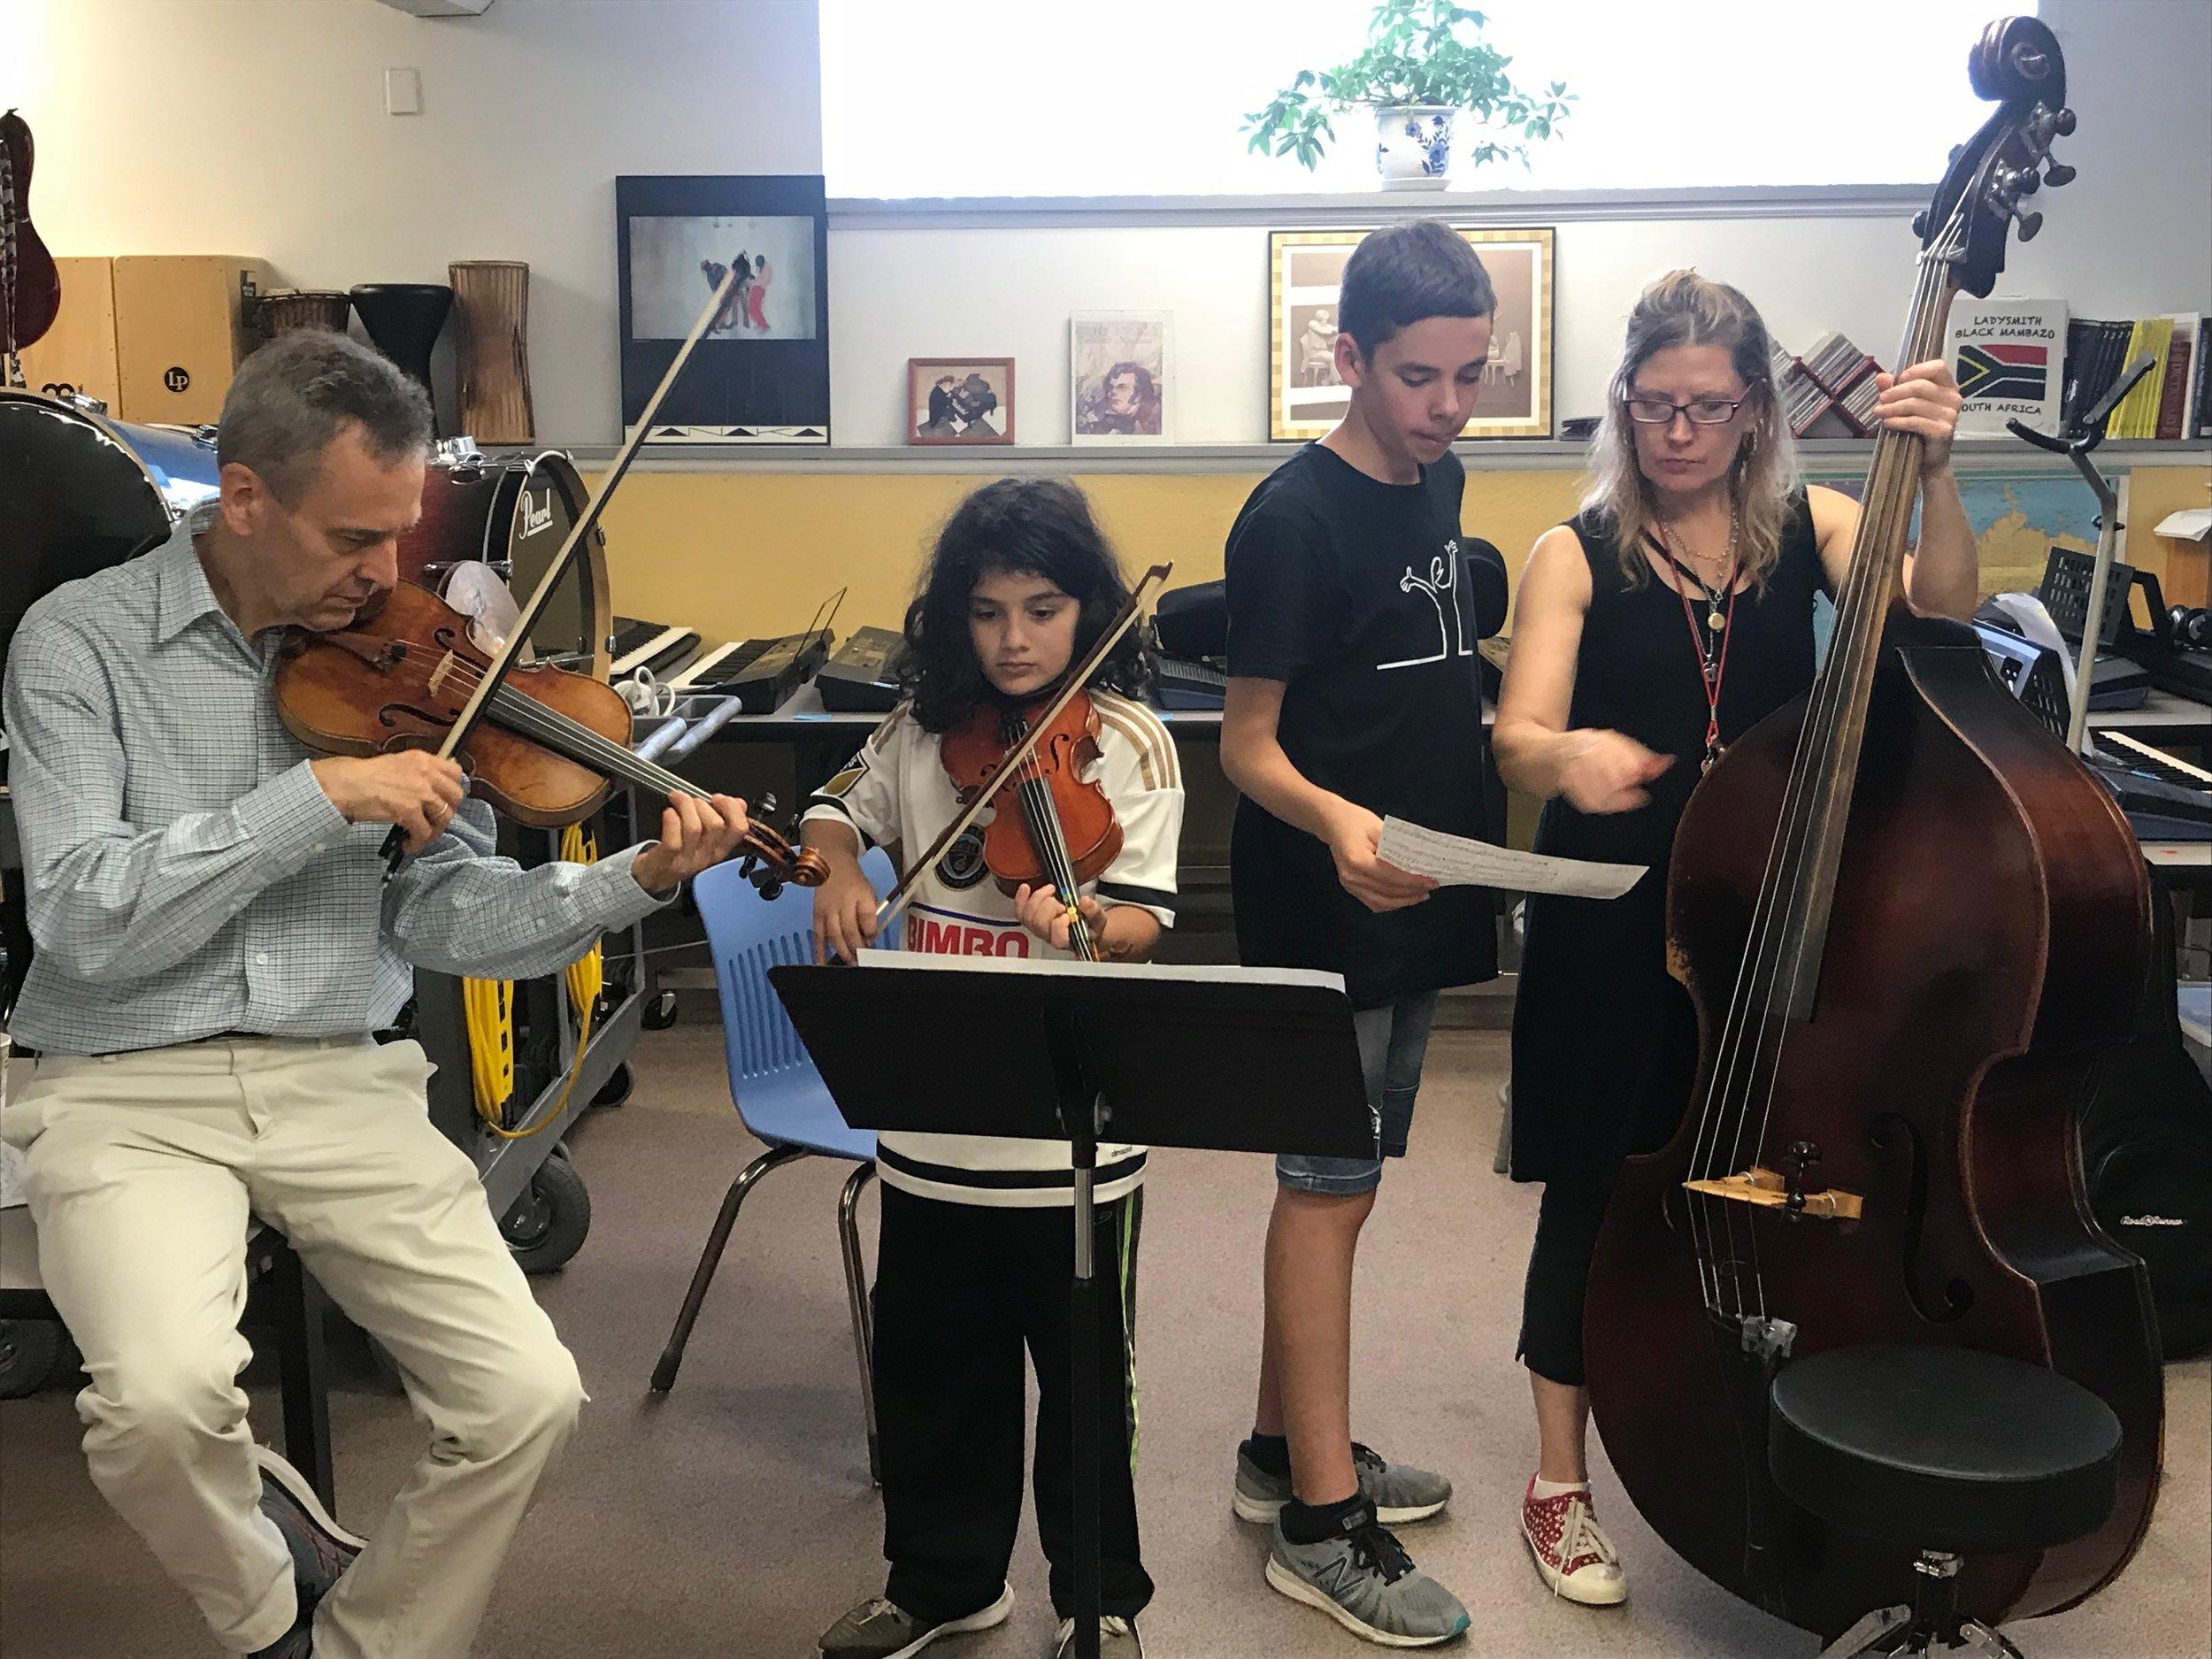 Intensives-Fall 2018-Folk Music-2.JPG